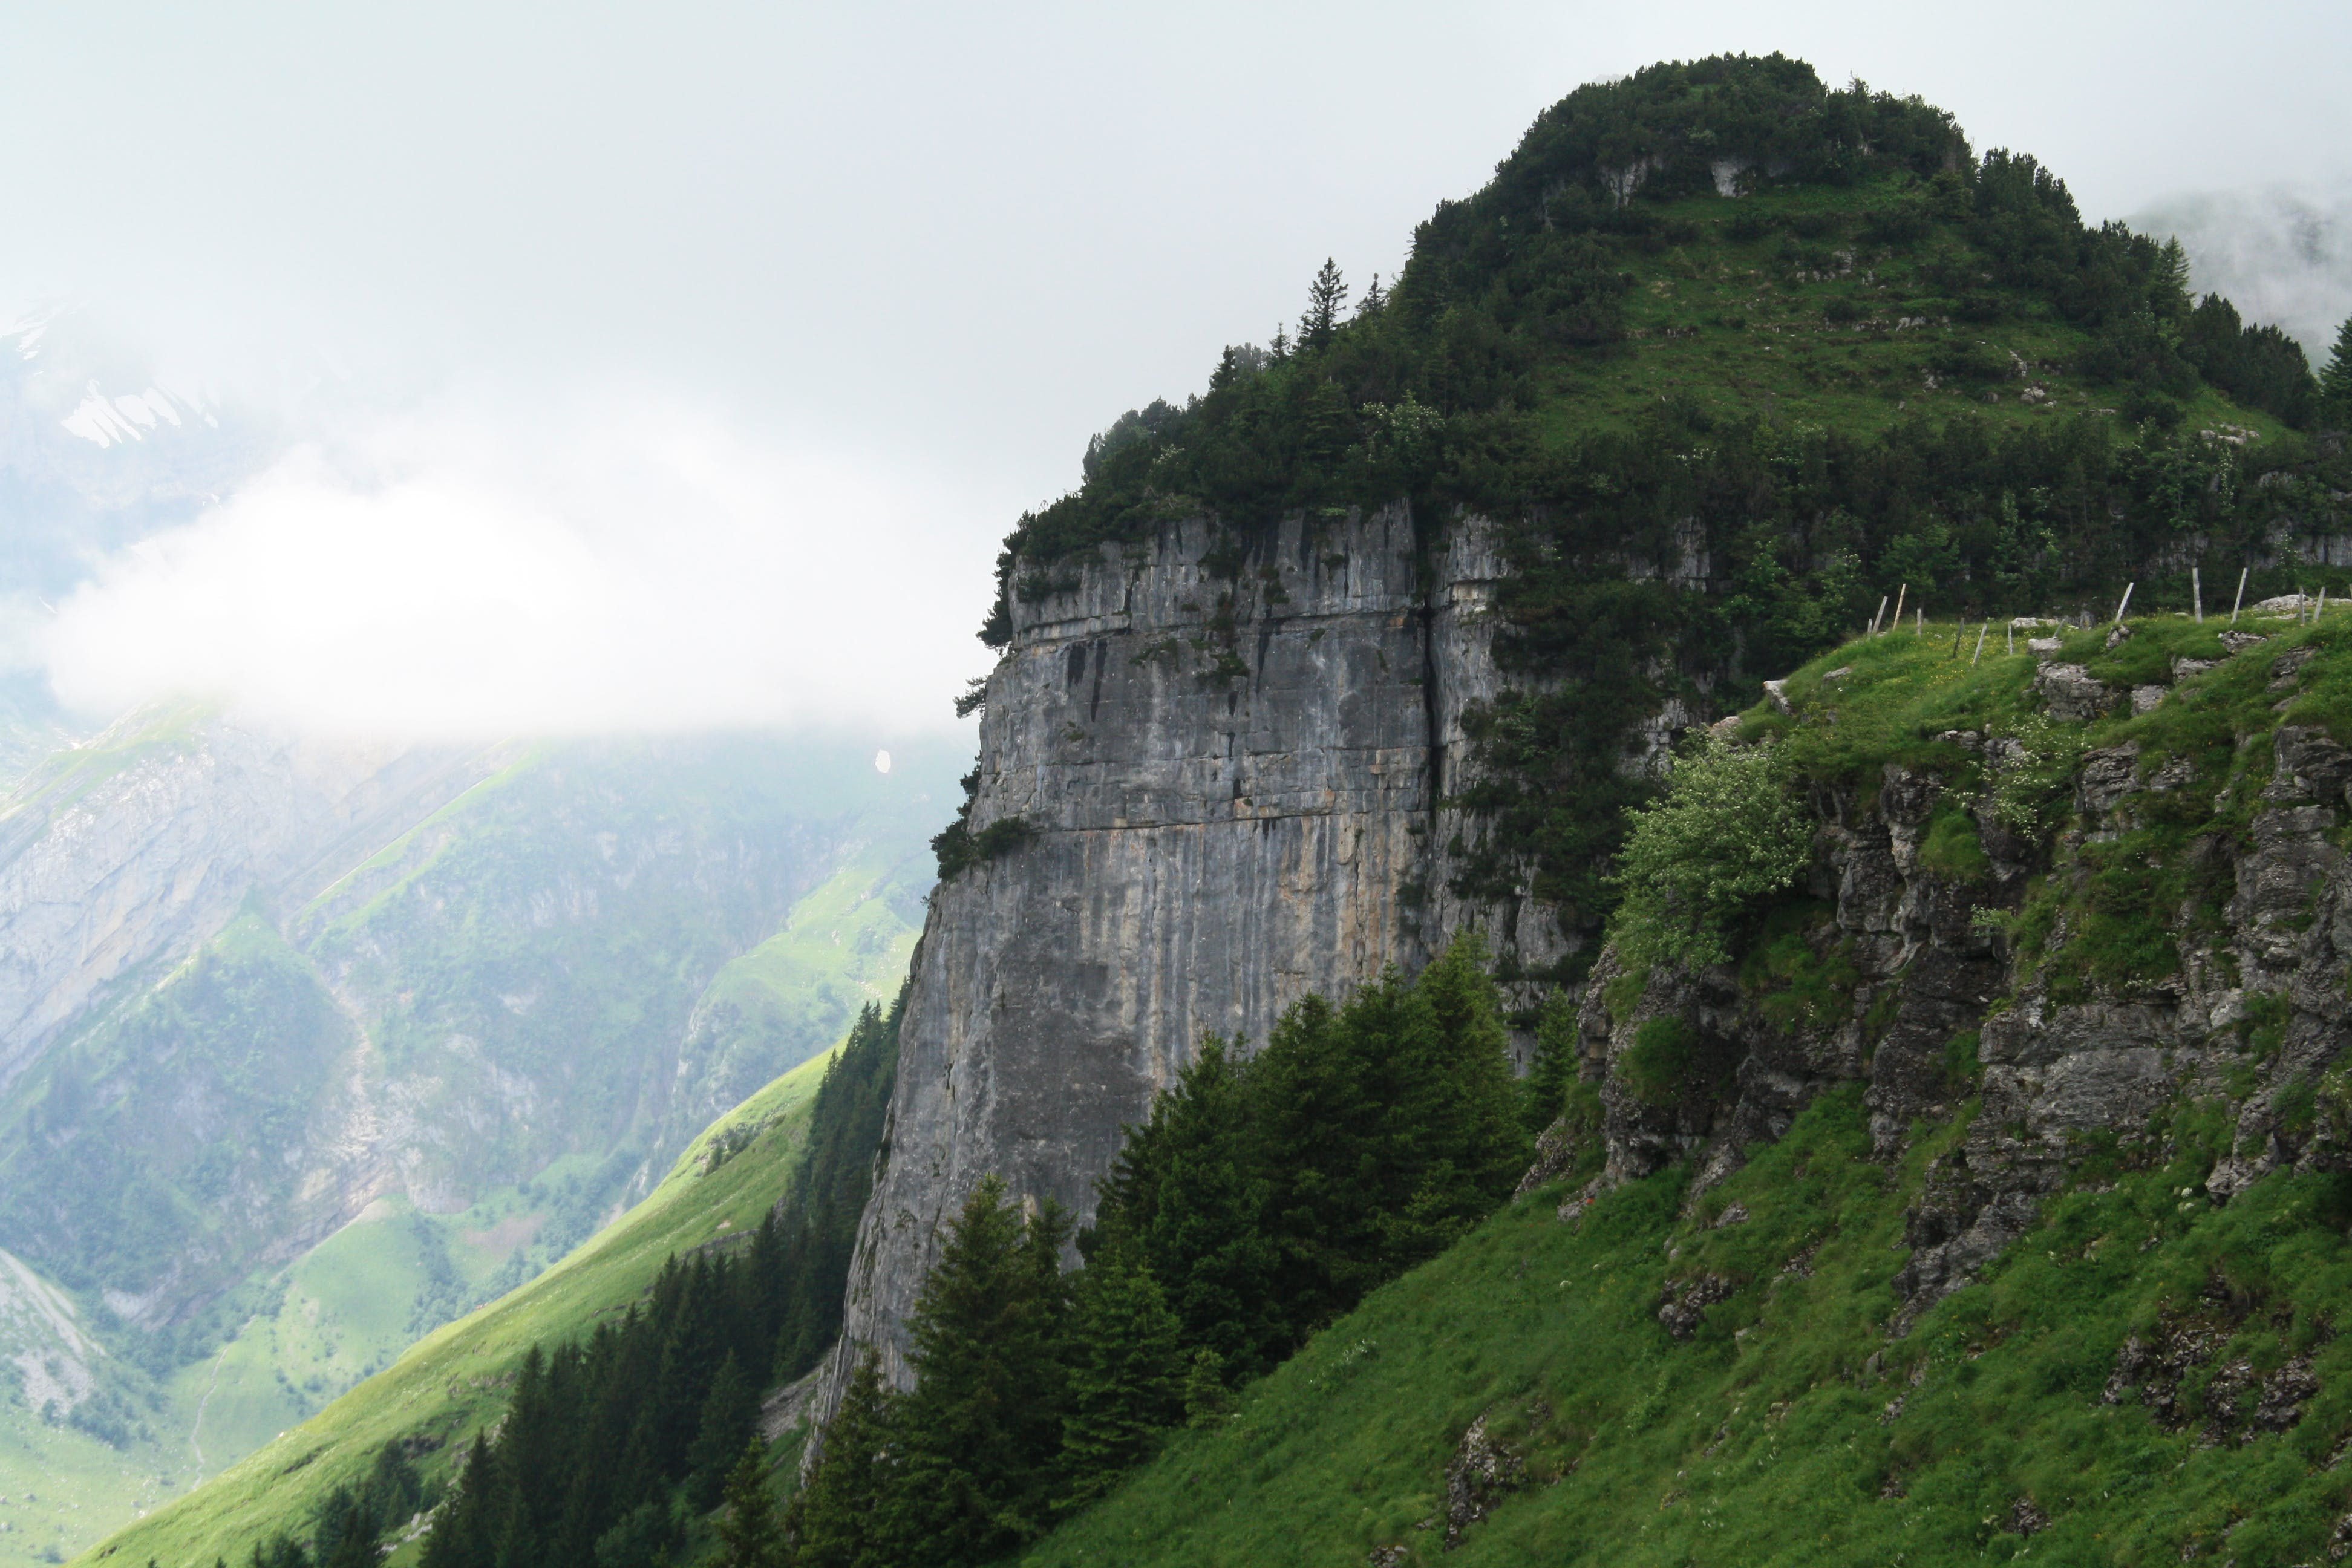 Gratis lagerfoto af bjerge, Schweiz